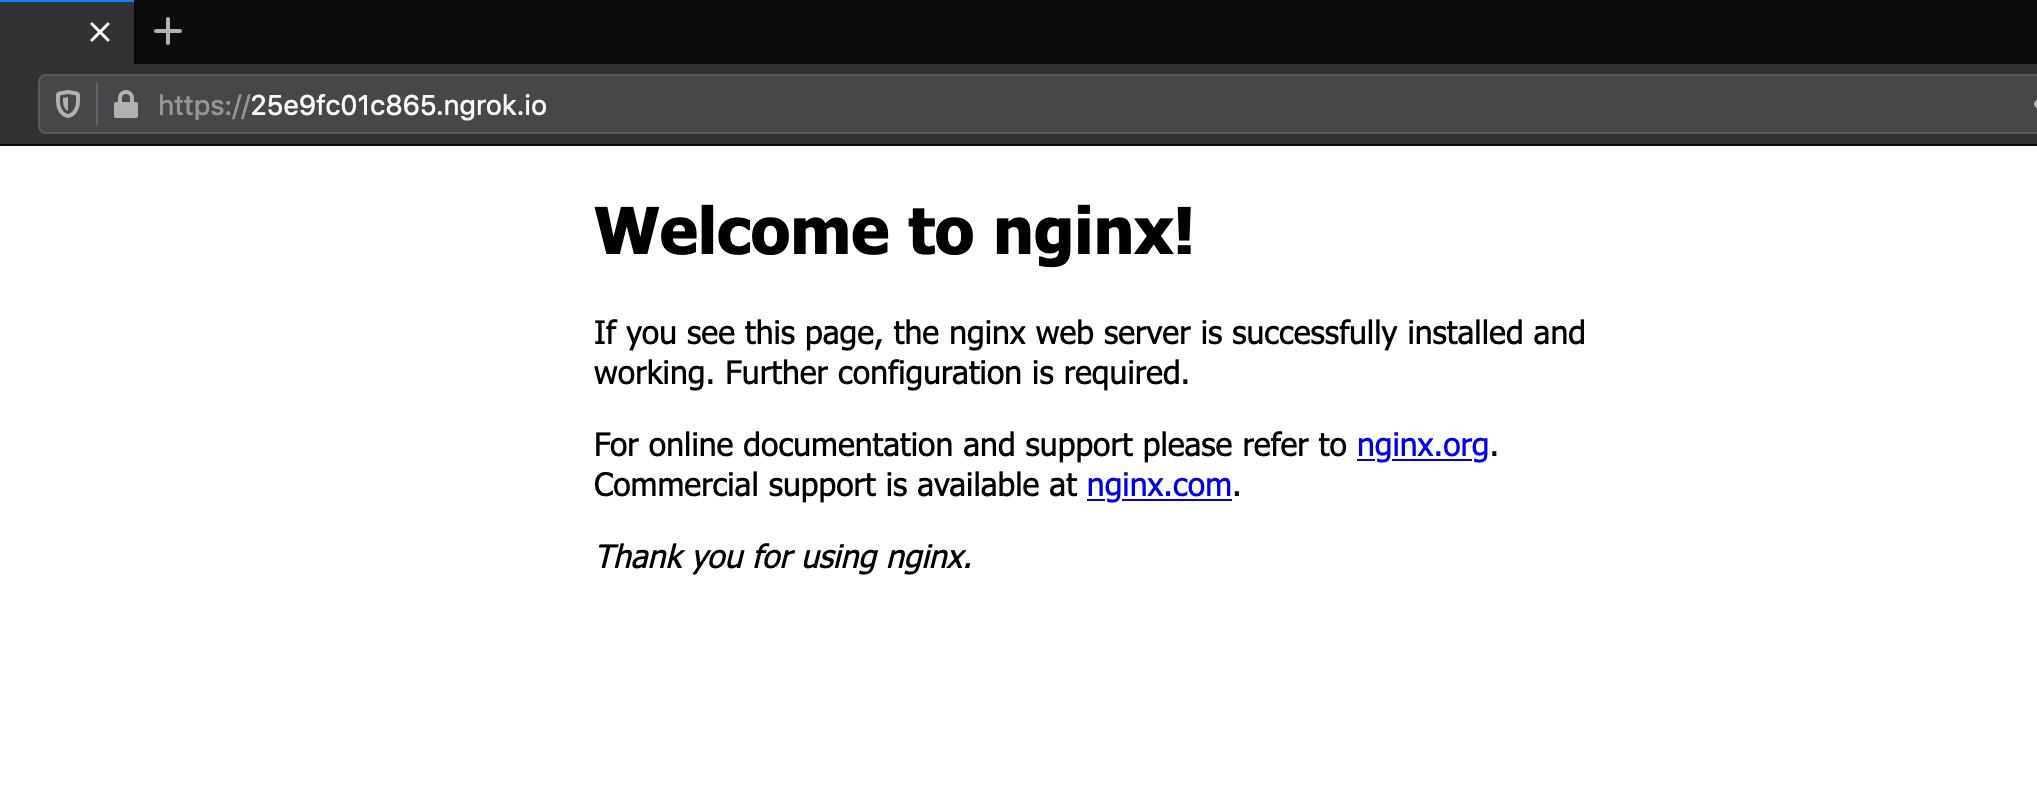 http://server.digimetriq.com/wp-content/uploads/2021/01/1610911801_260_Running-a-single-node-Kubernetes-cluster-using-Minikube-on-Ubuntu.png